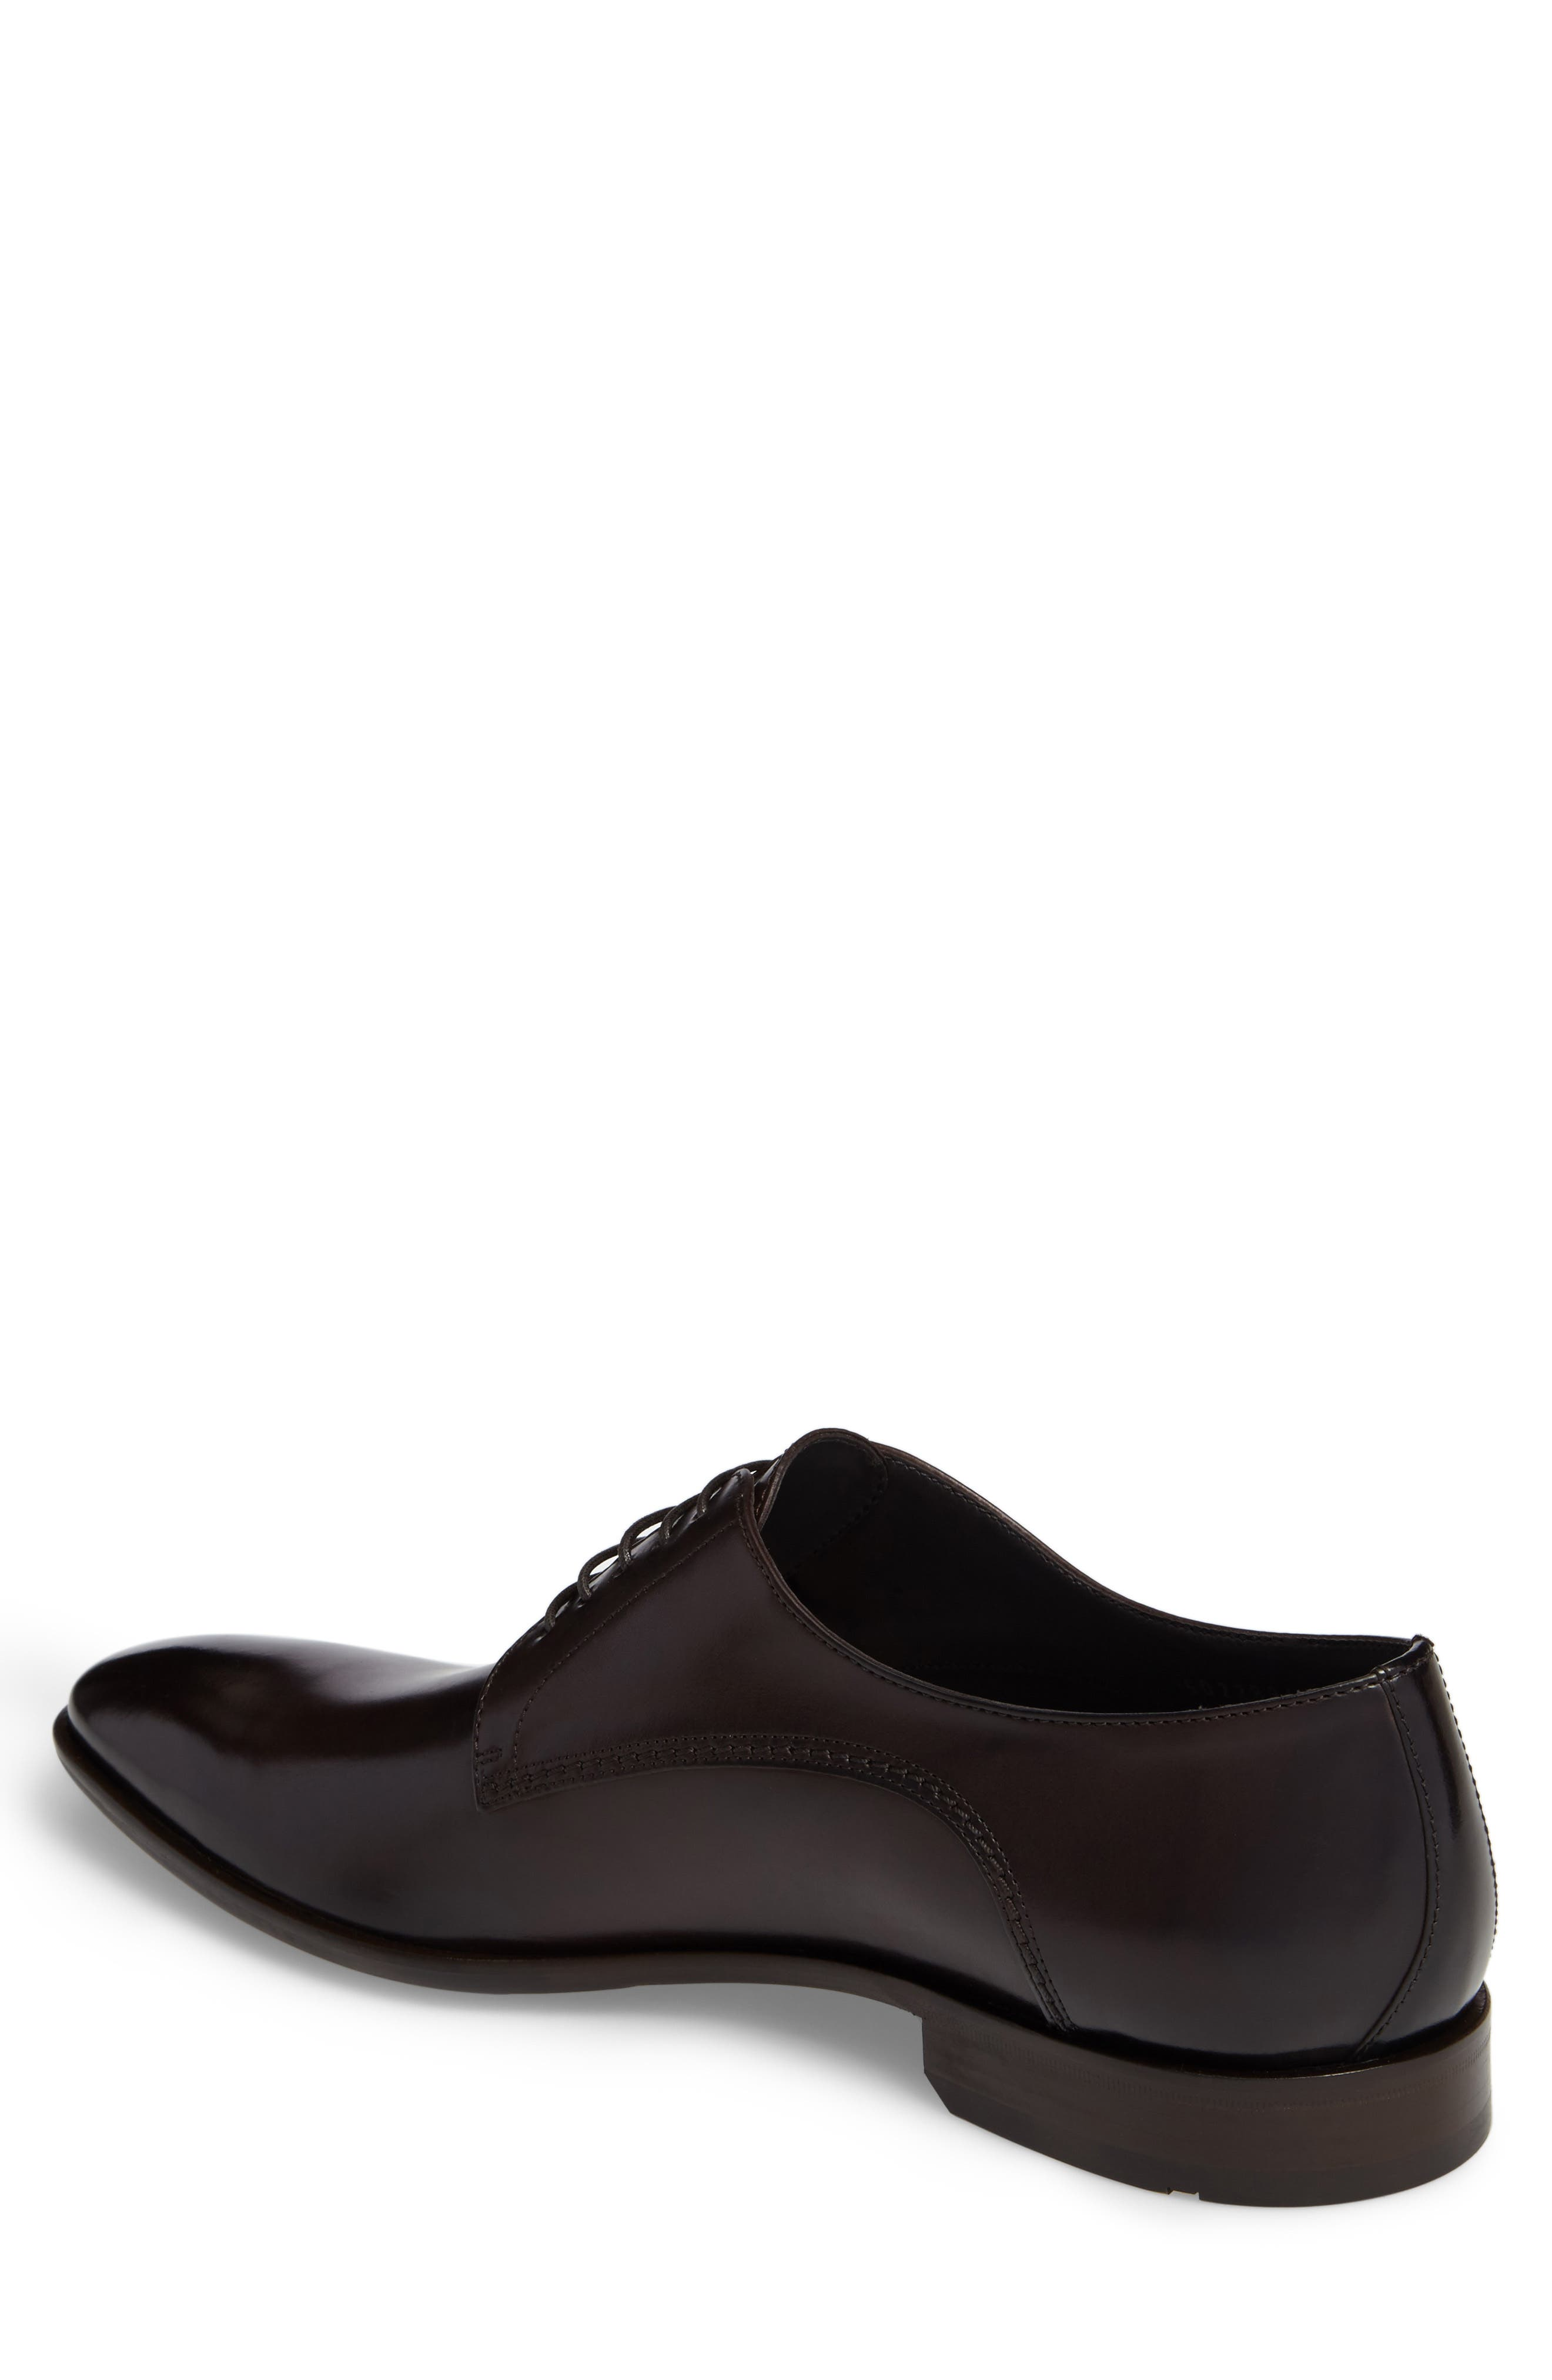 Carmons Plain Toe Derby,                             Alternate thumbnail 2, color,                             Dark Brown Leather